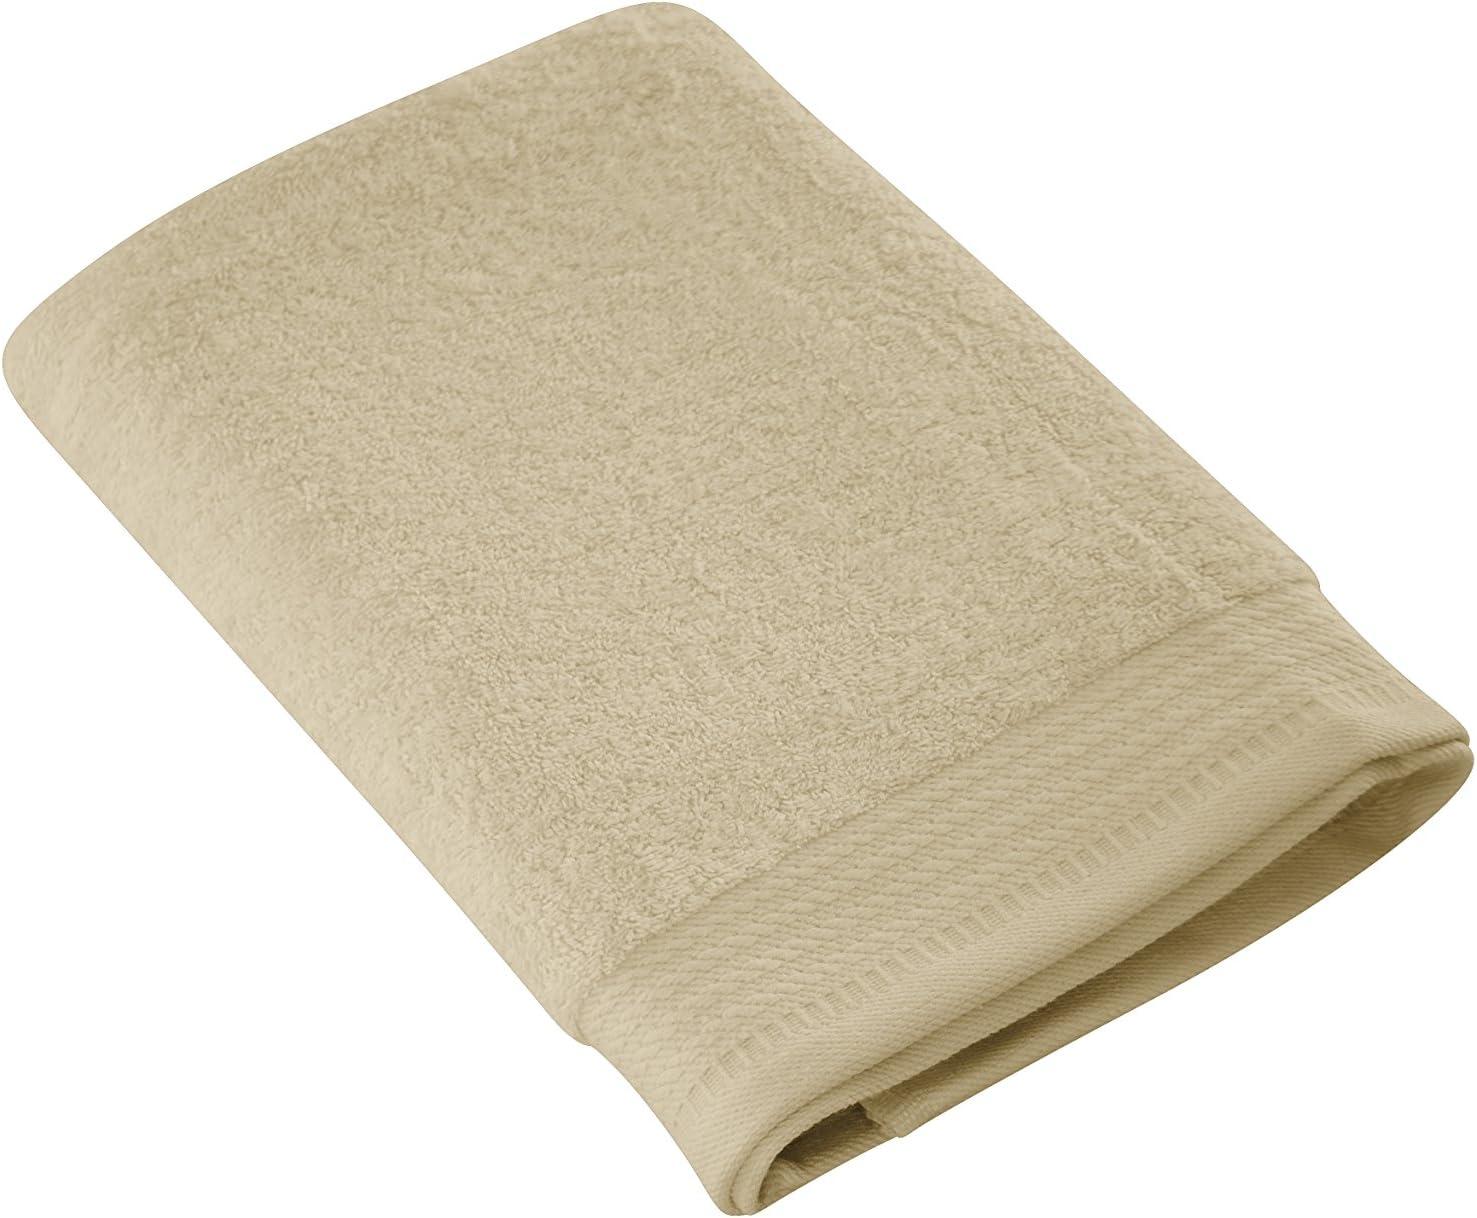 Camel Eiffel Textile Toalla de Lavabo 50x100x10 cm Algod/ón